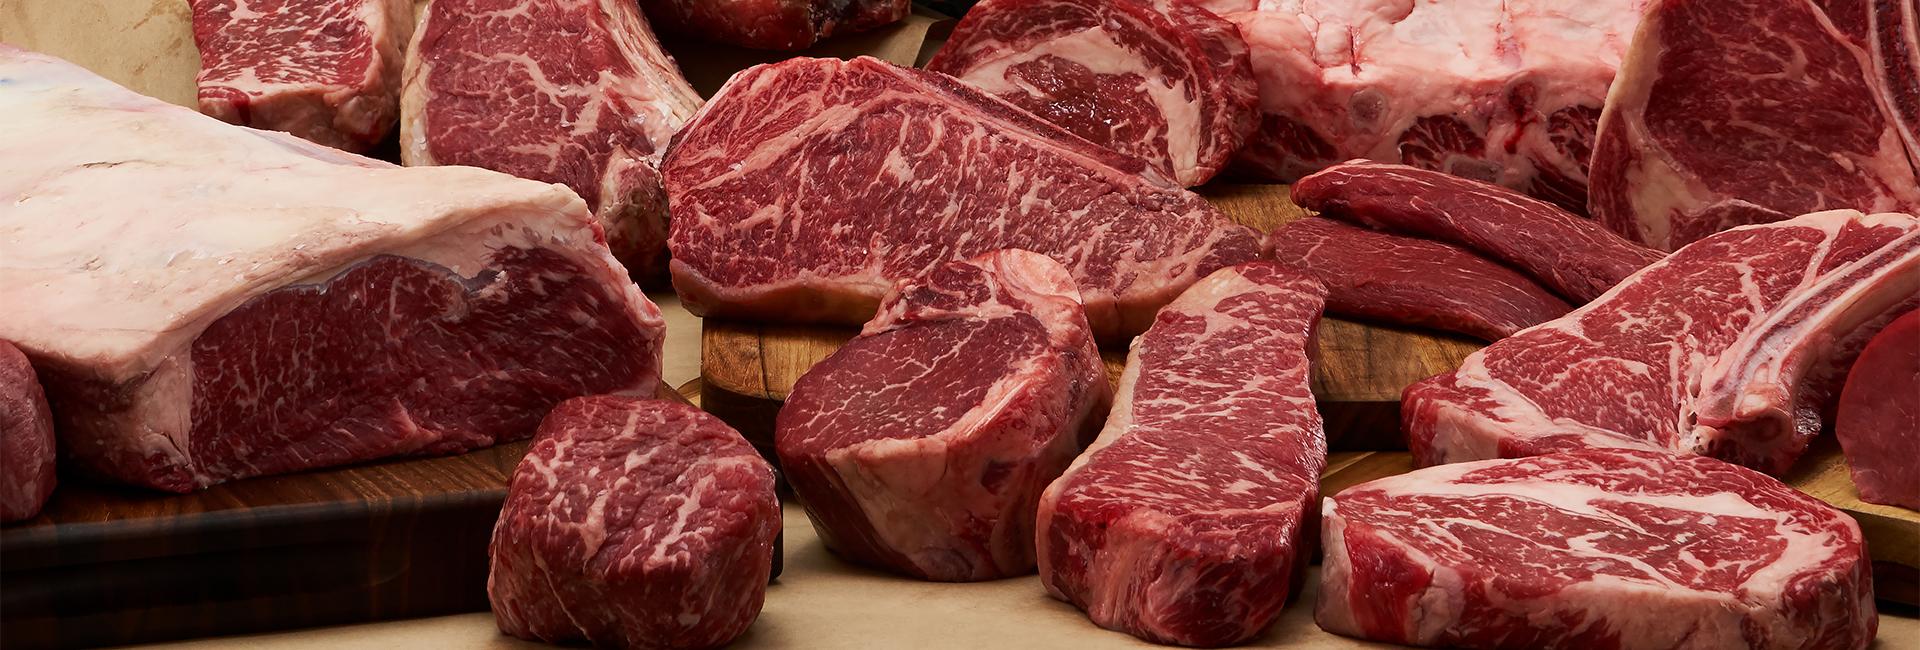 Fresh Meat Market Charlotte Nc